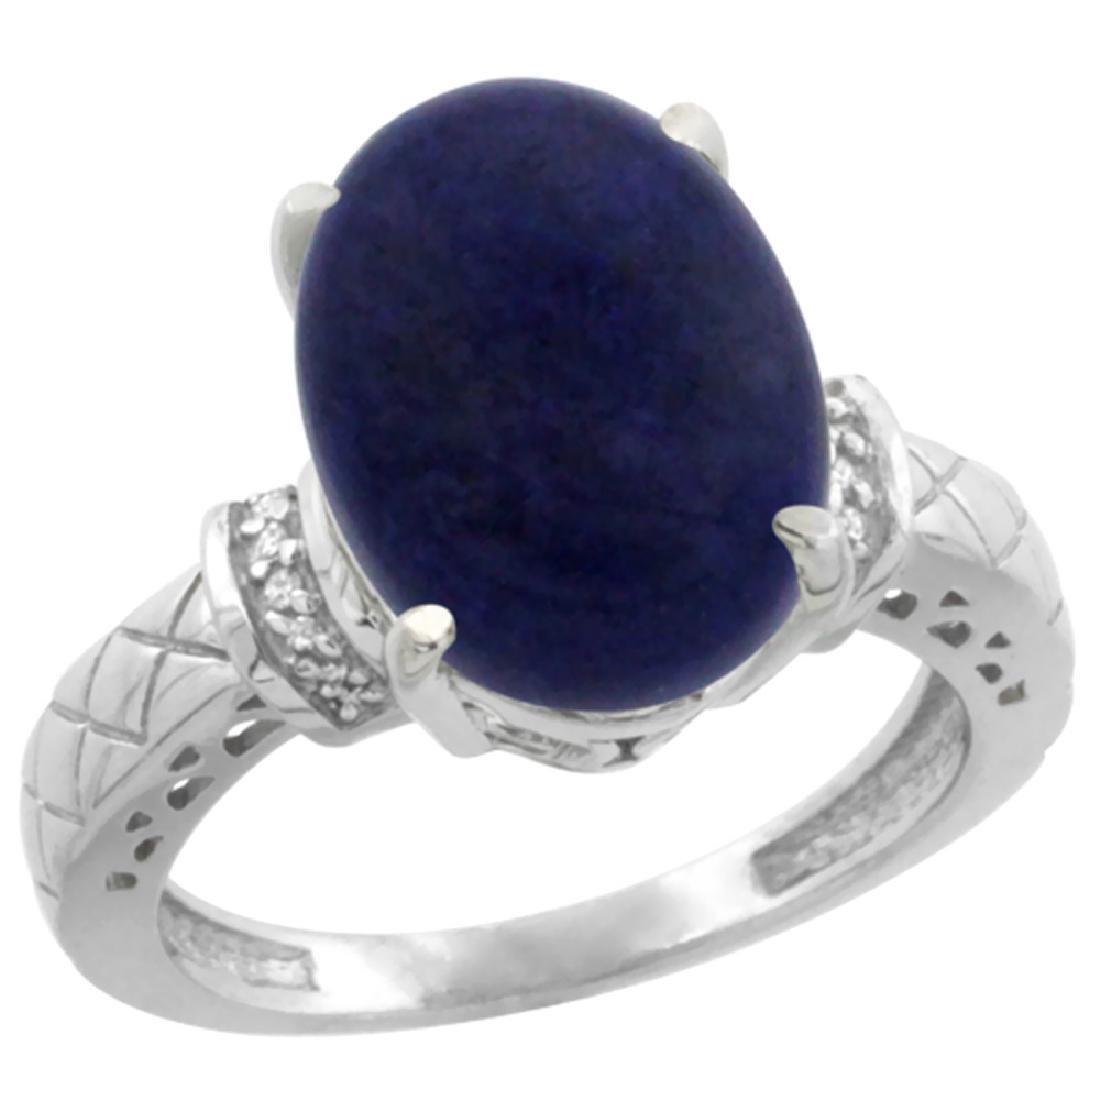 Natural 5.53 ctw Lapis & Diamond Engagement Ring 14K